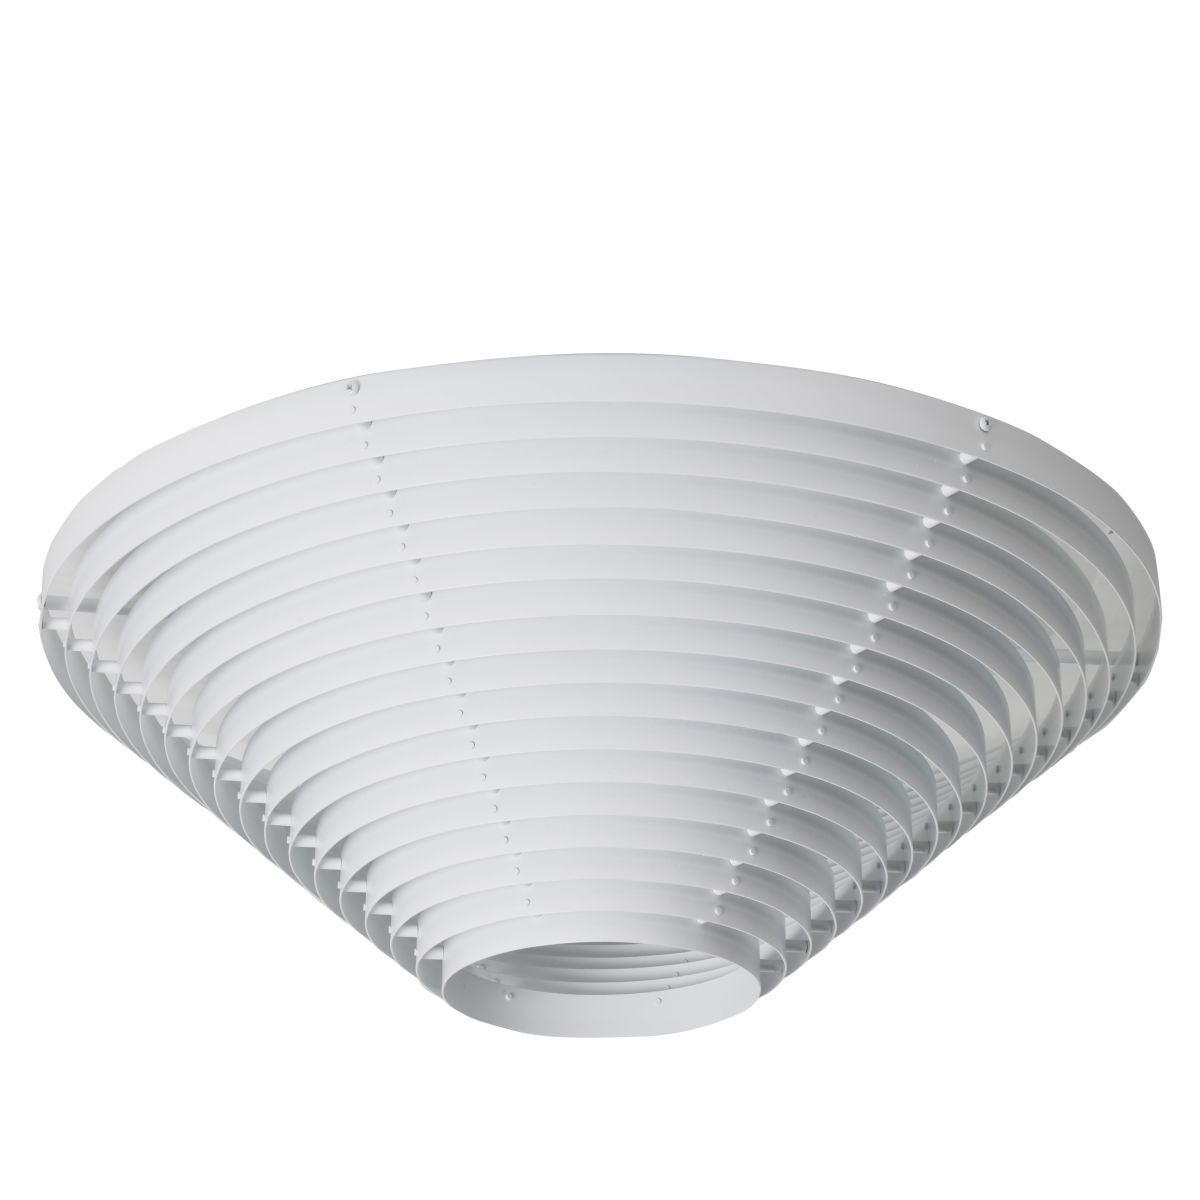 eng light cobolight ceiling lights fr banner products